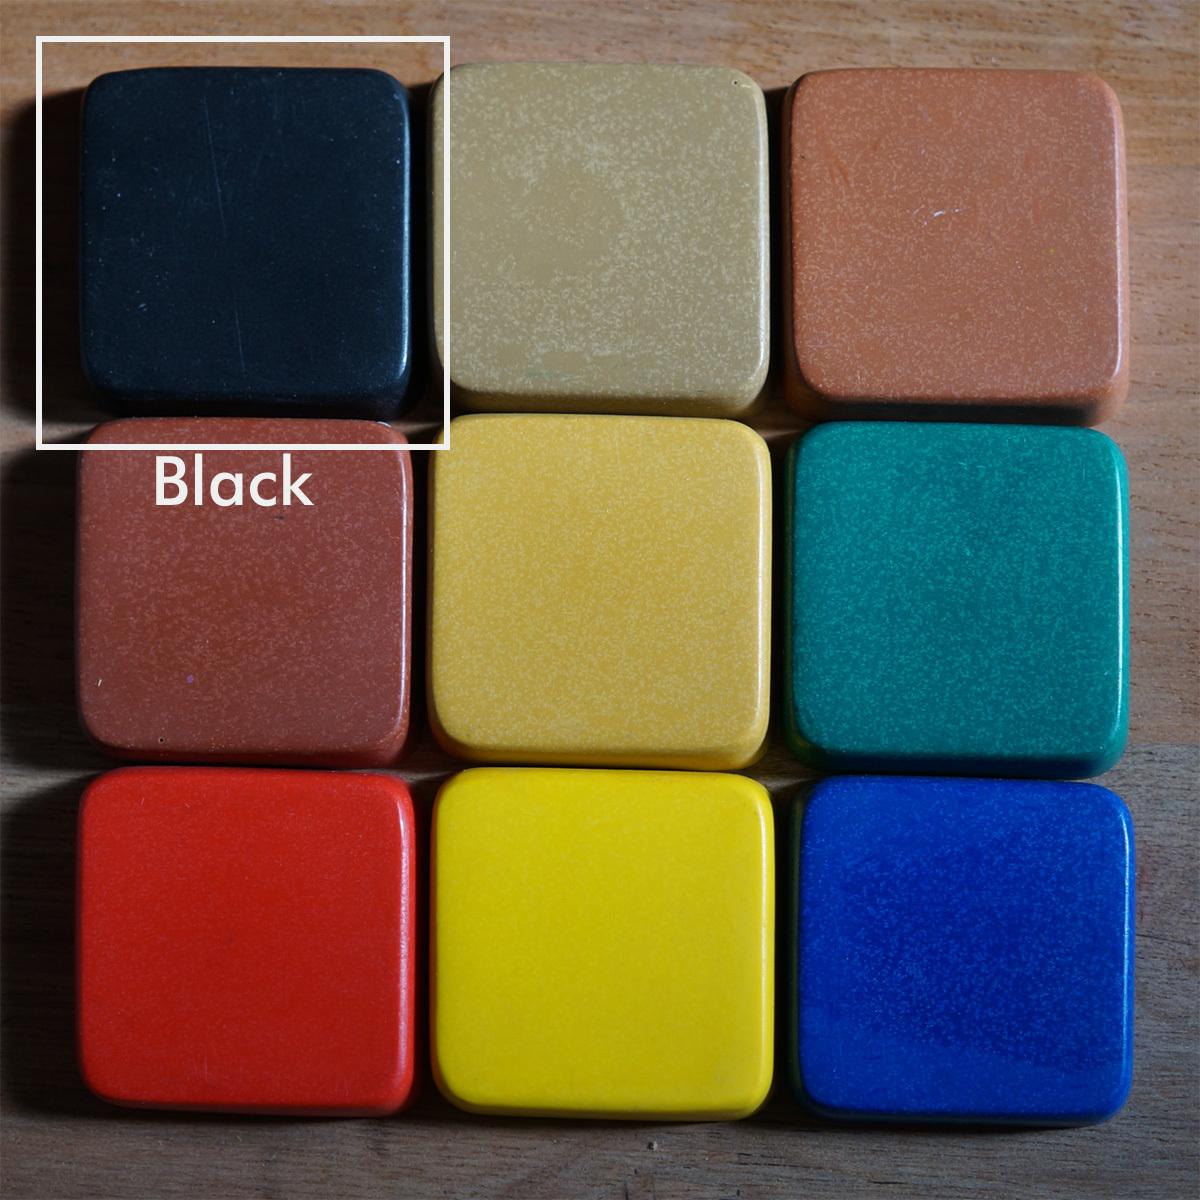 PIGMENT BLACK 1kg(着色剤:黒 1kg) - 画像2